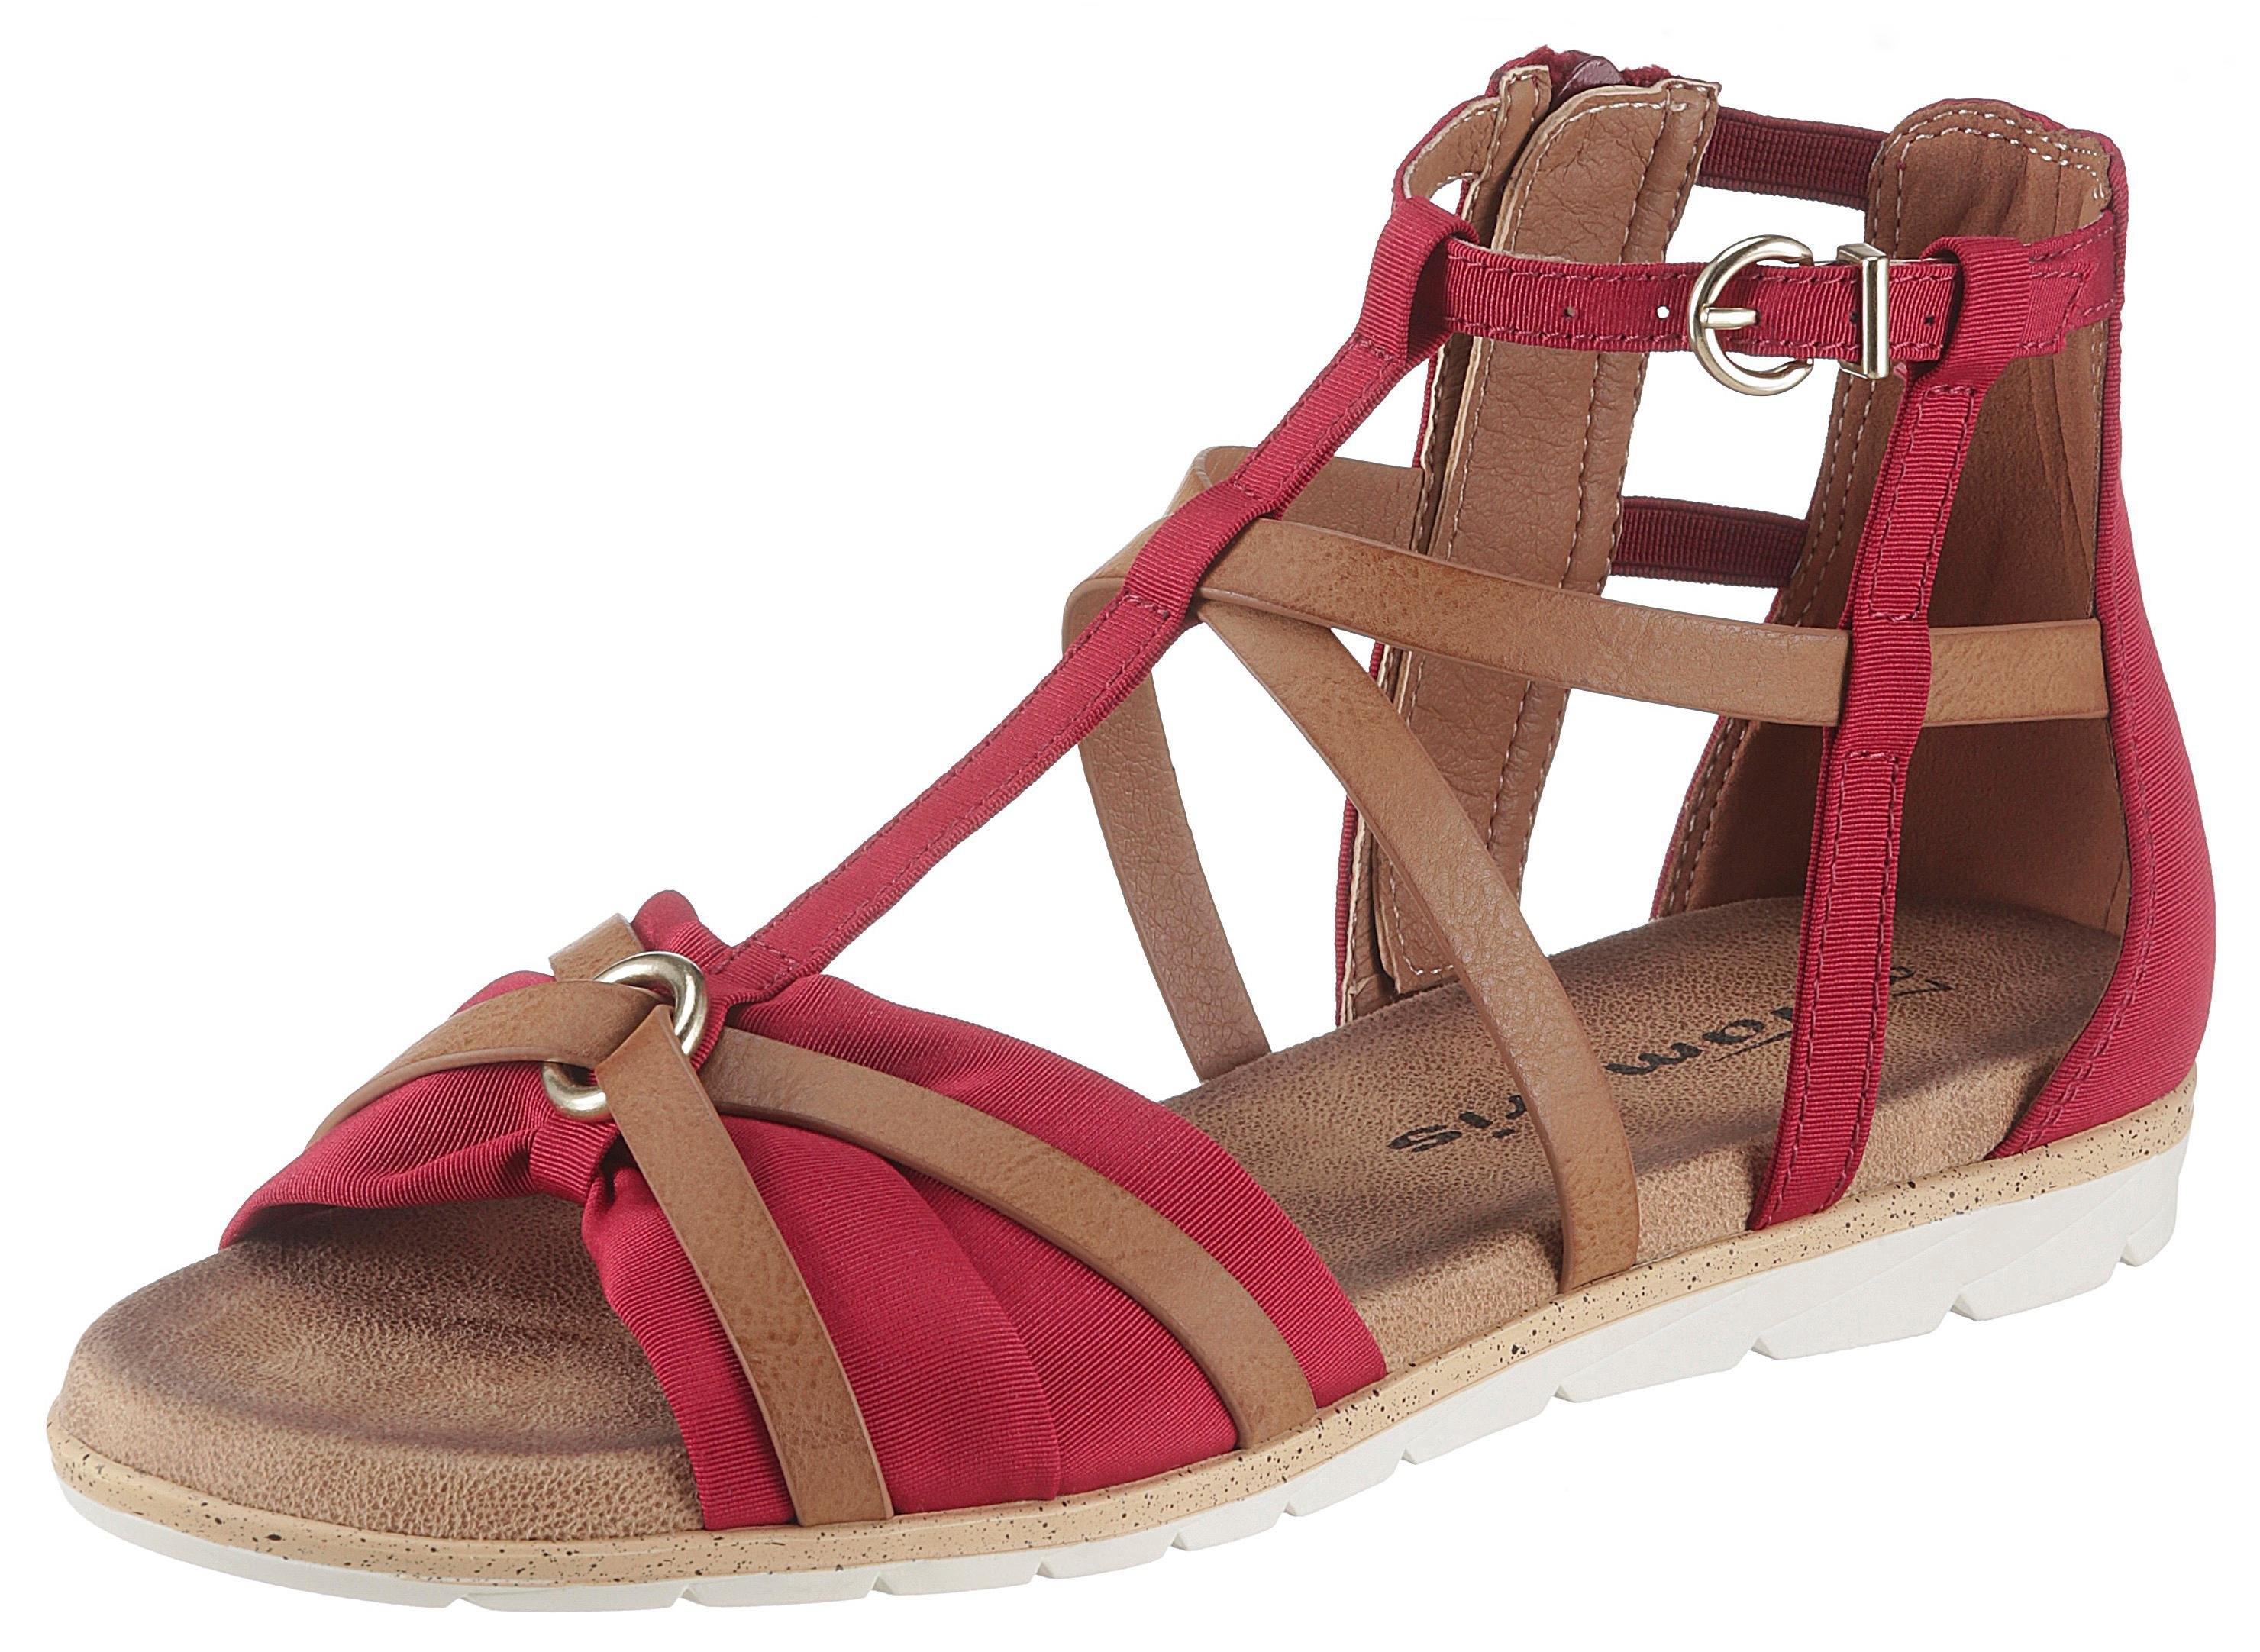 Tamaris romeinse sandalen »Sidra« nu online bestellen